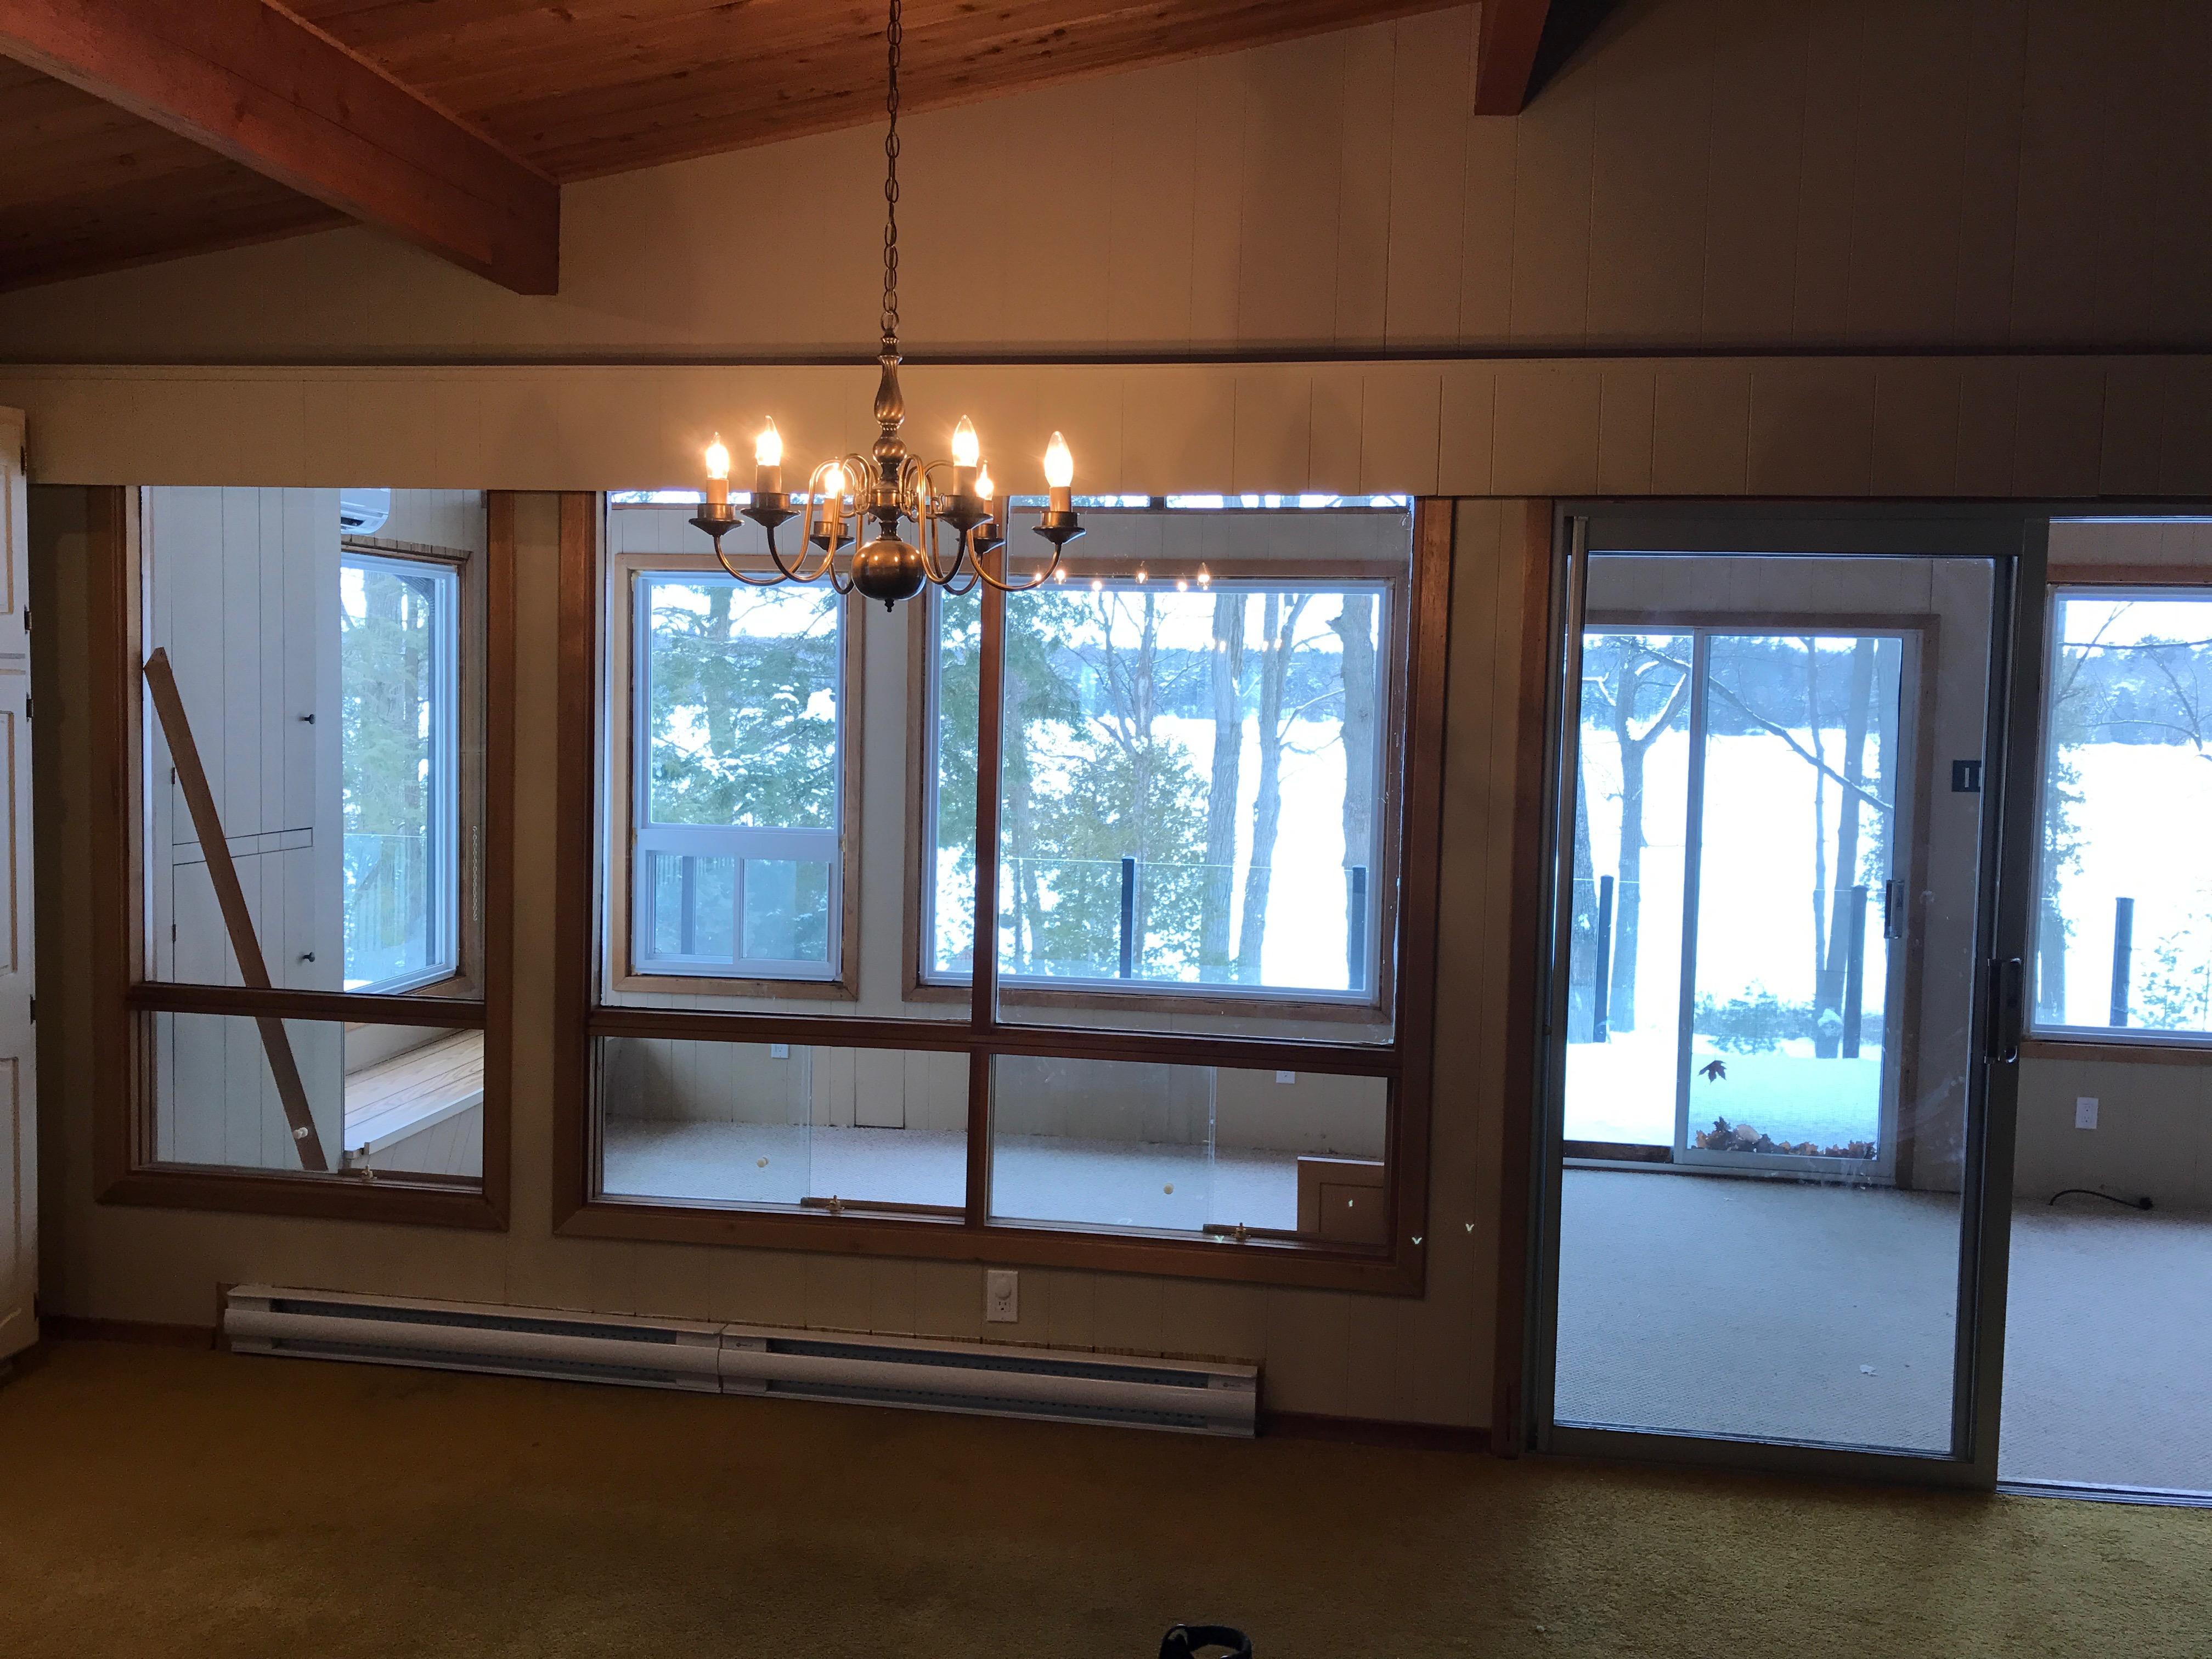 Design and renovate project - The Revival  - Interior Pre Construction